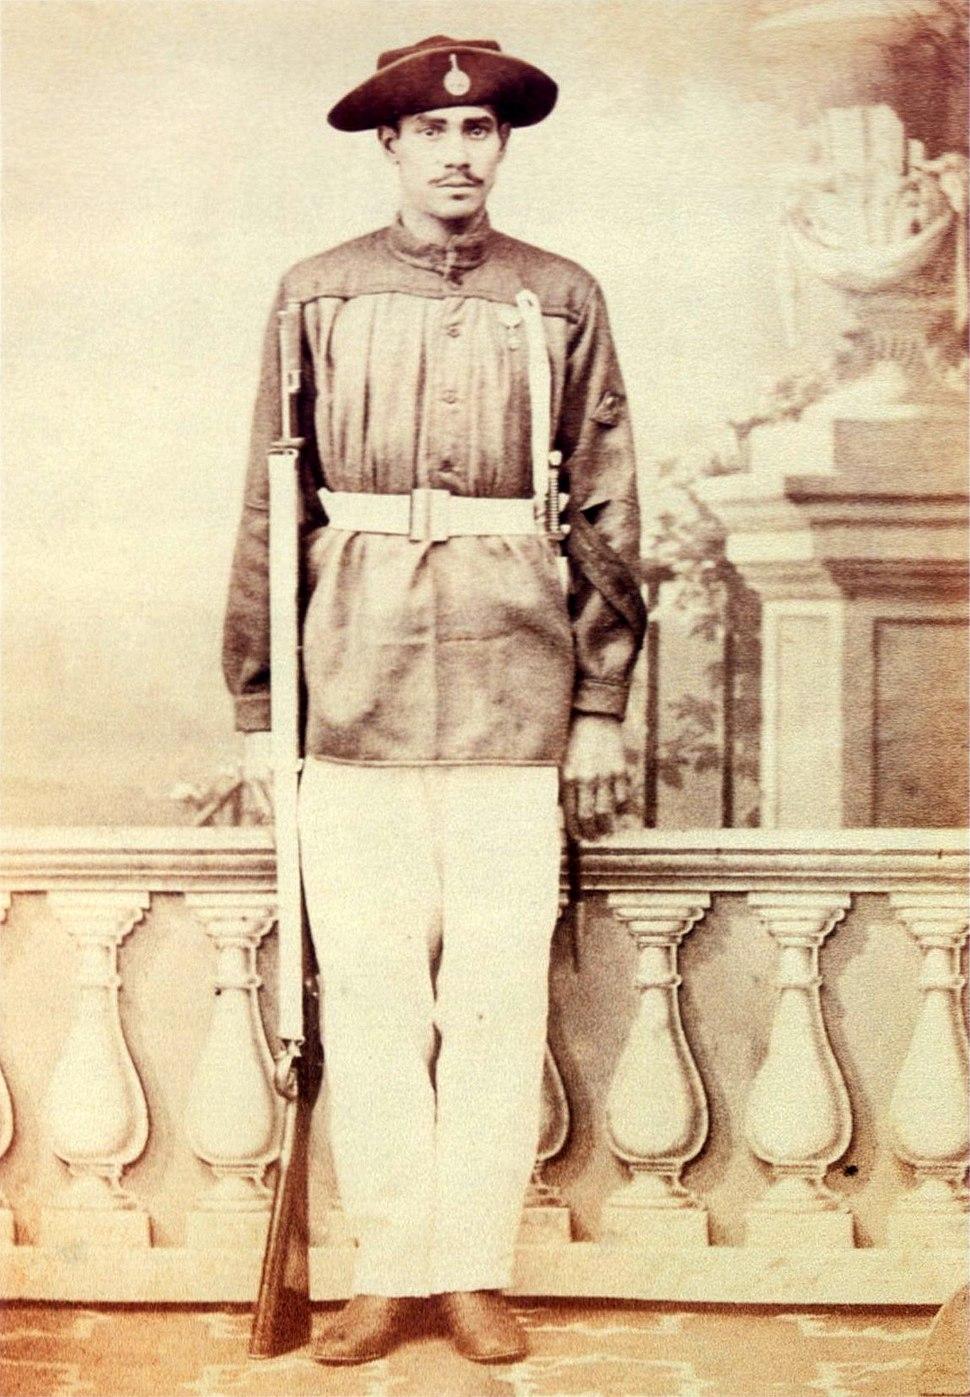 Brazilian corporal of the 1st Fatherland Volunteer battalion